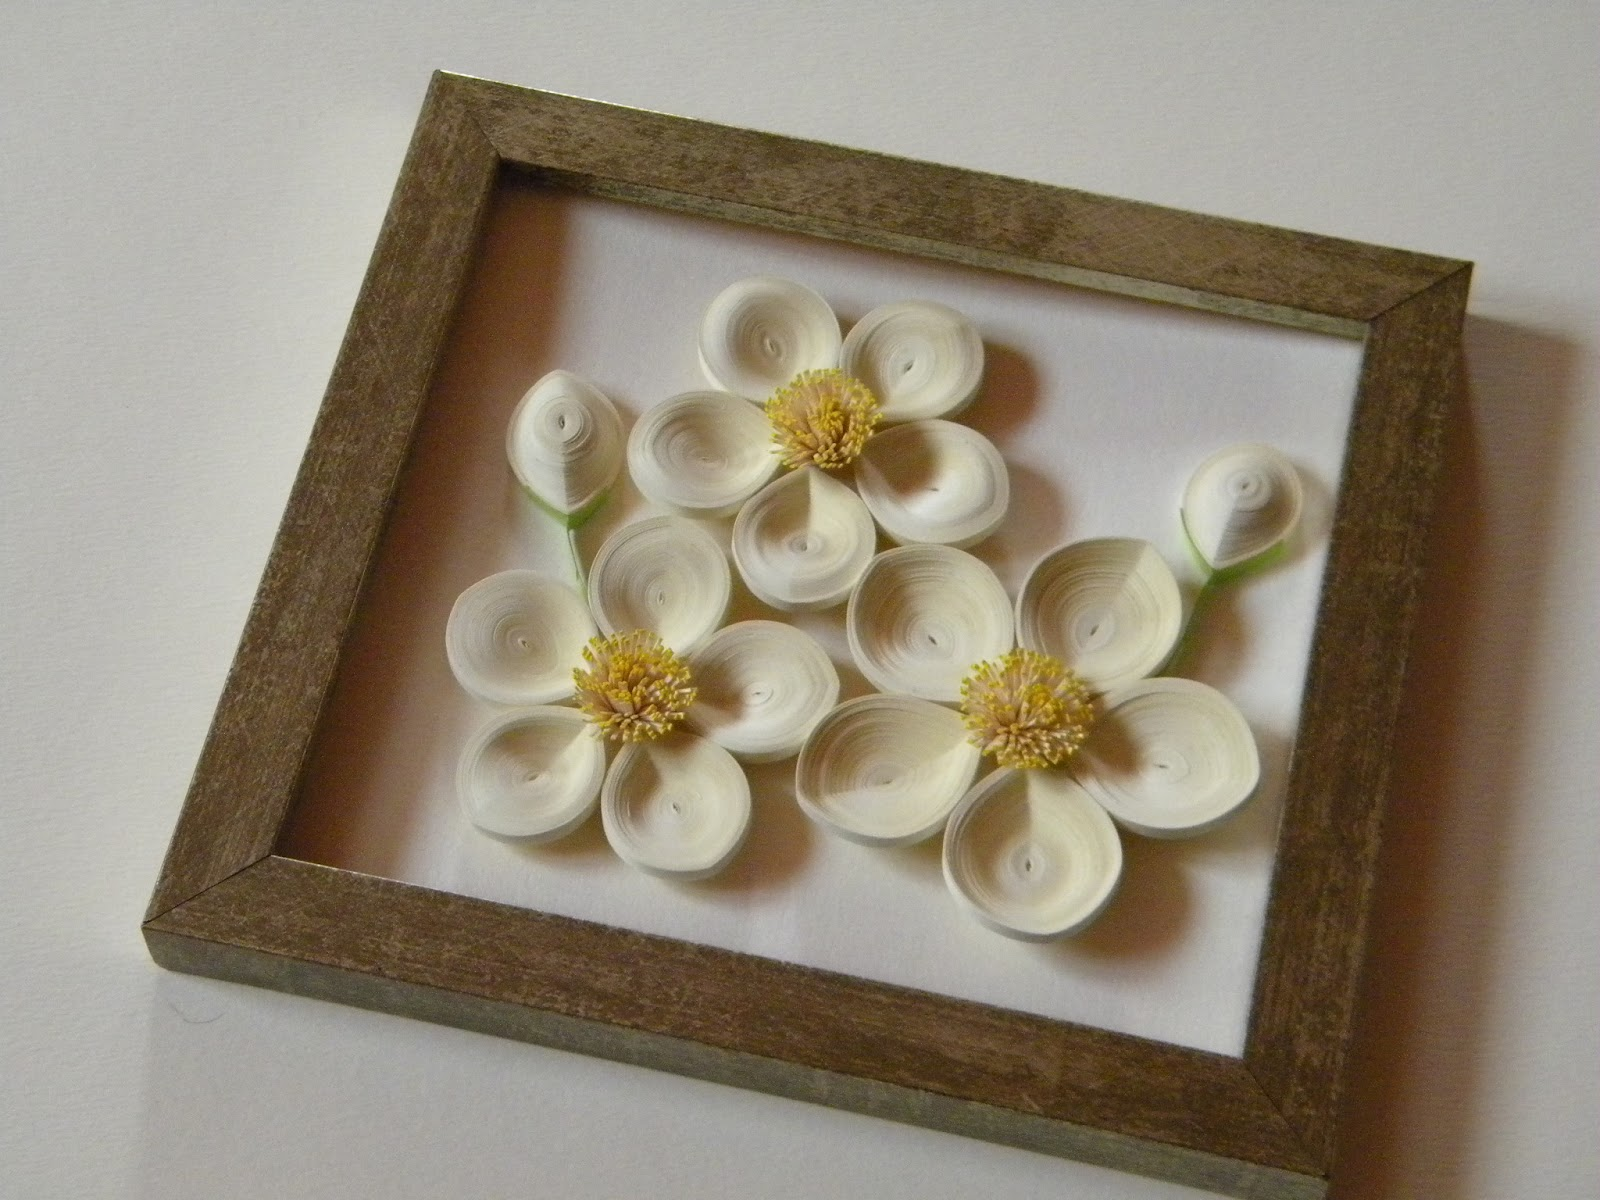 Invita ii de nunt personalizate quilling framed flowers for Idee decorazioni casa fai da te